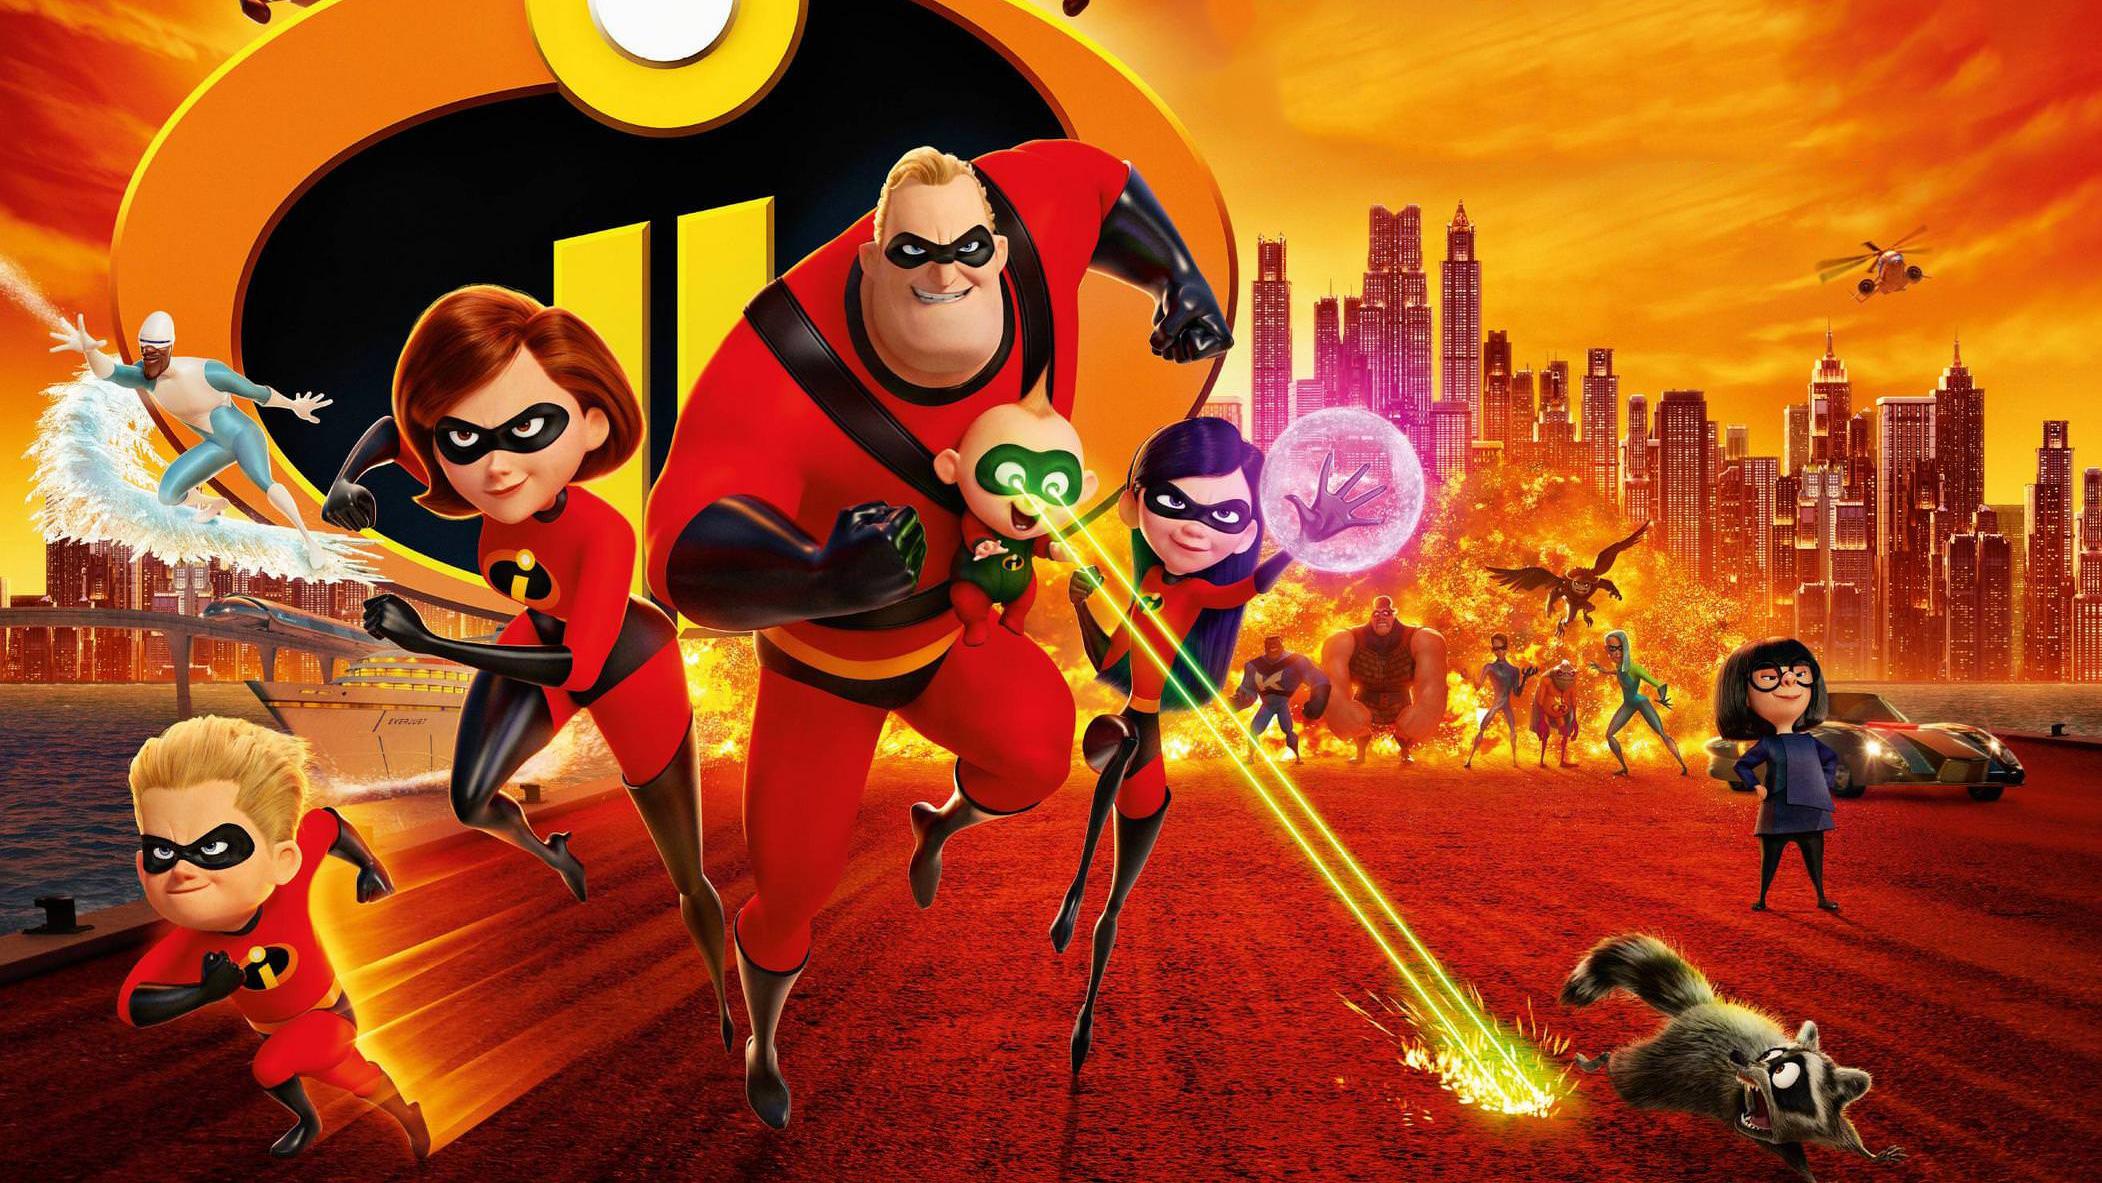 سوپر هیروهای دوست داشتنی ( Incredibles 2 )